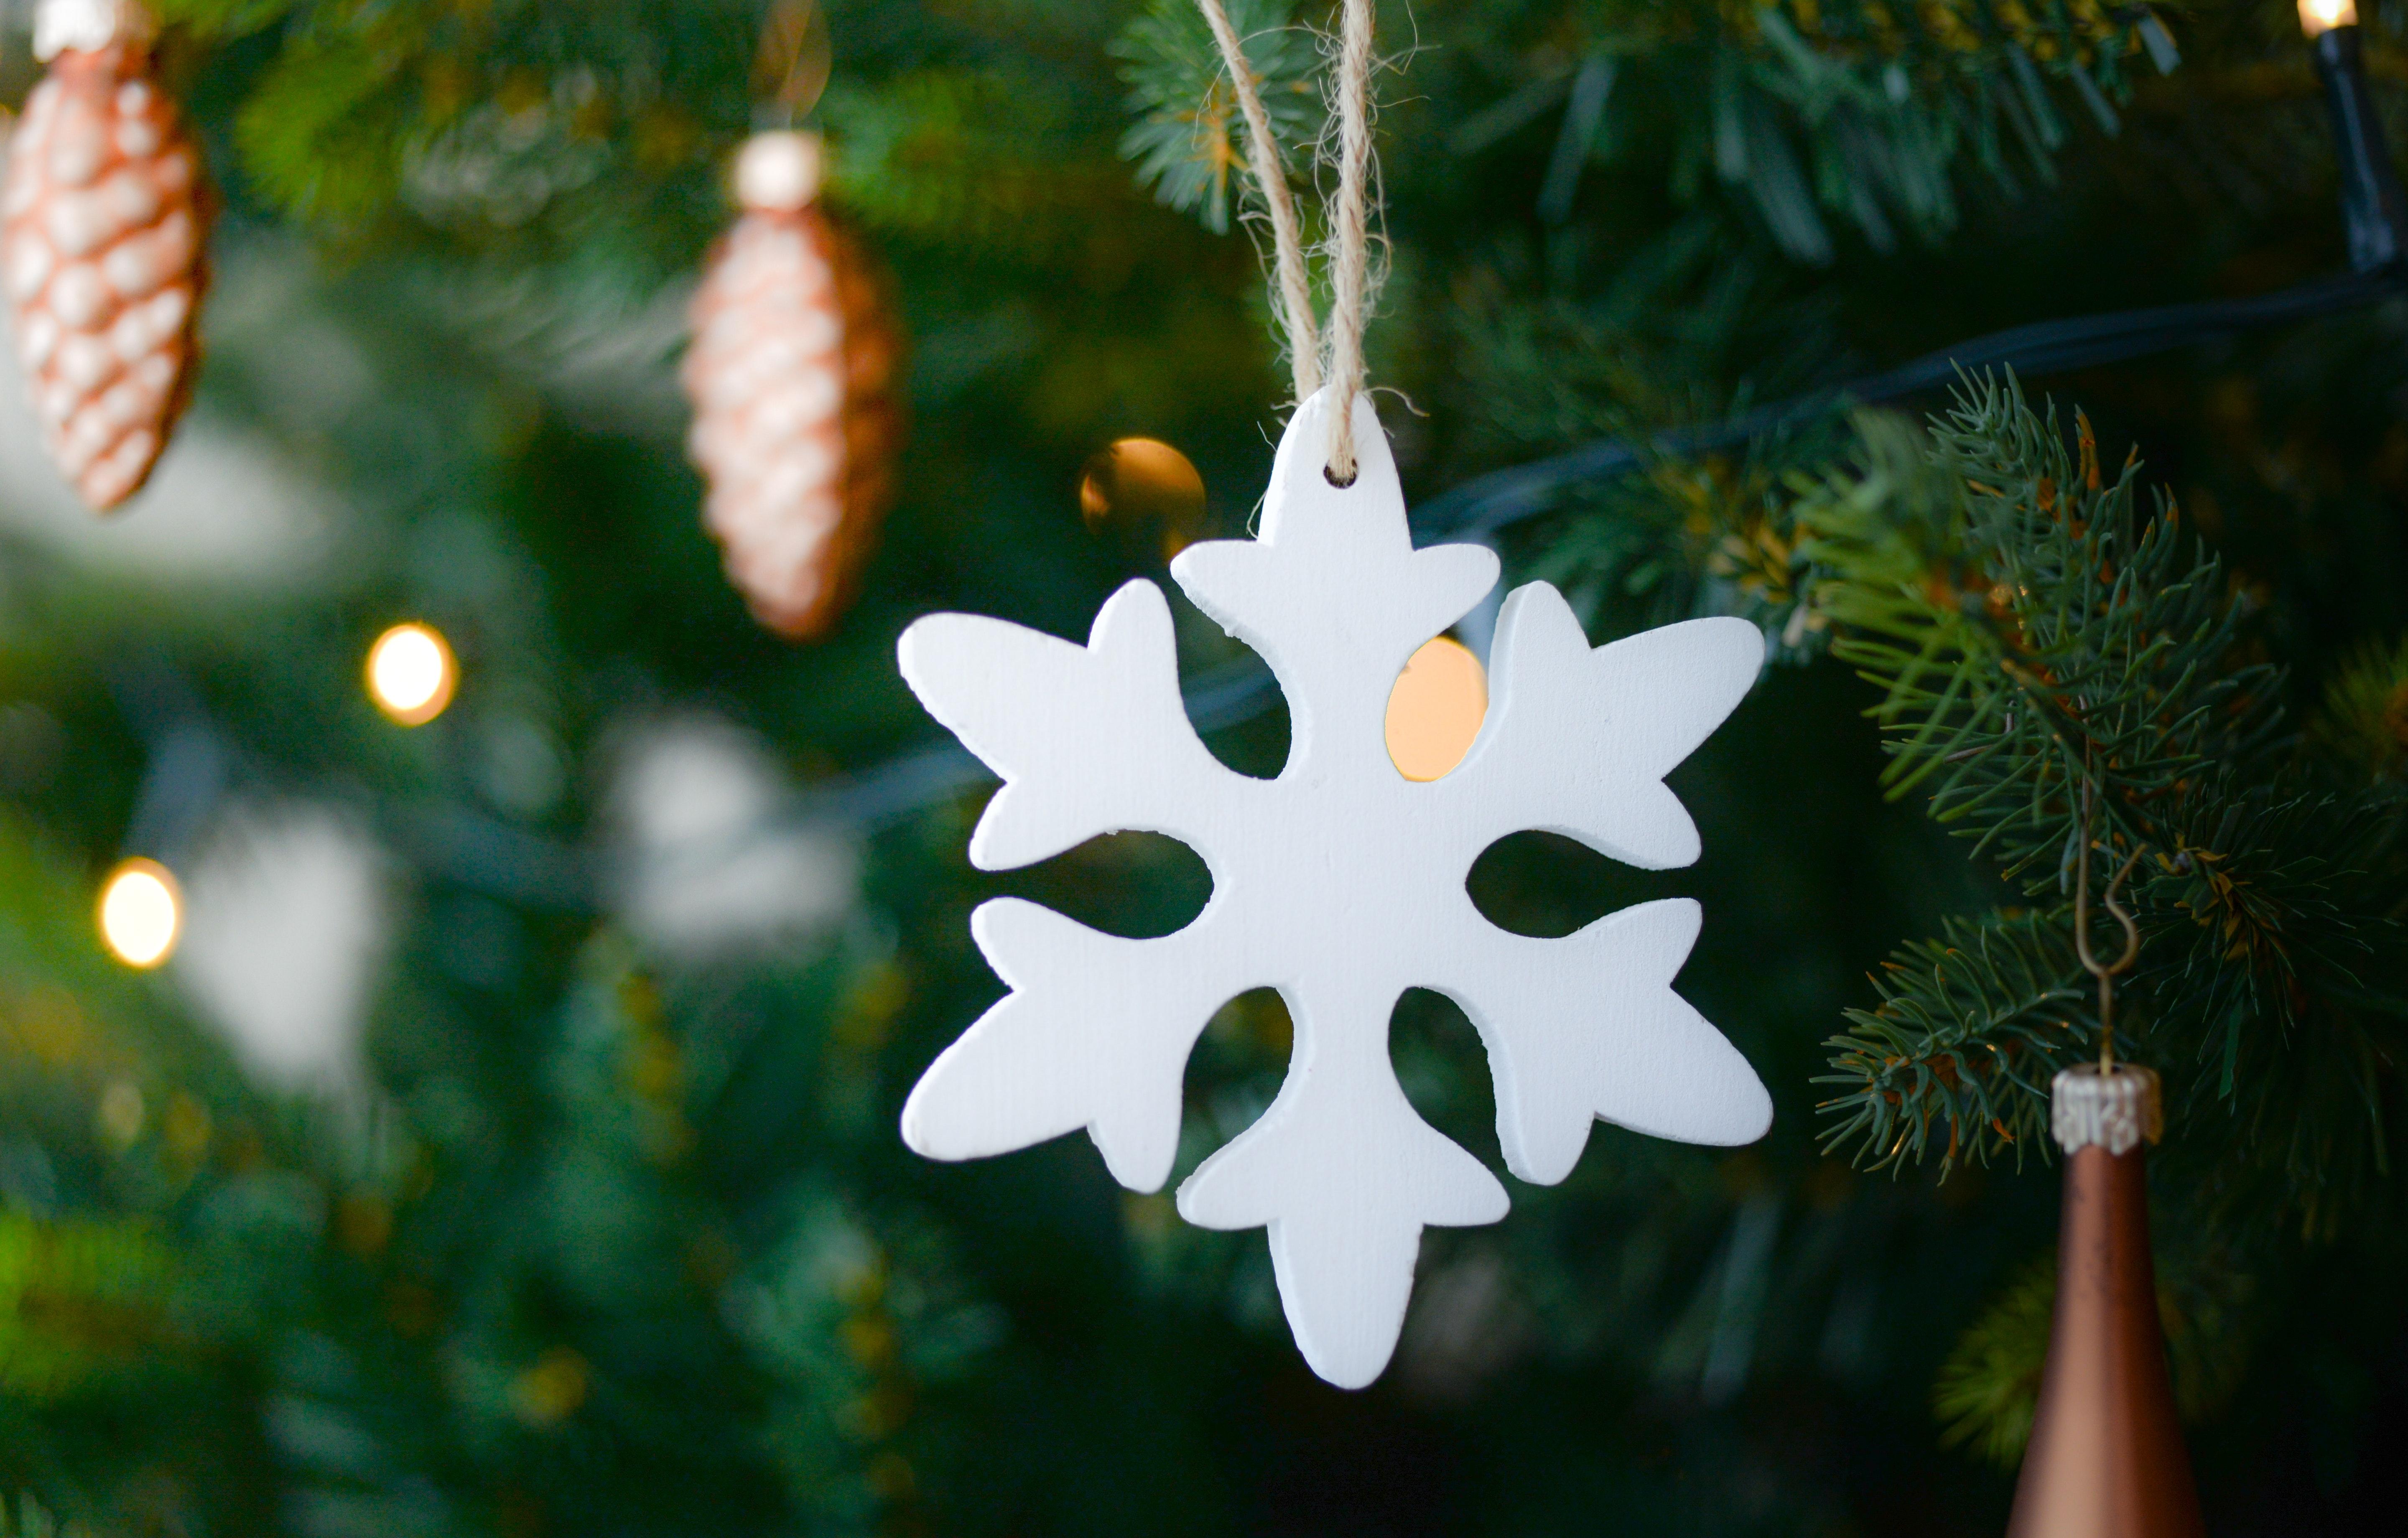 Free stock photos of christmas ornament · Pexels